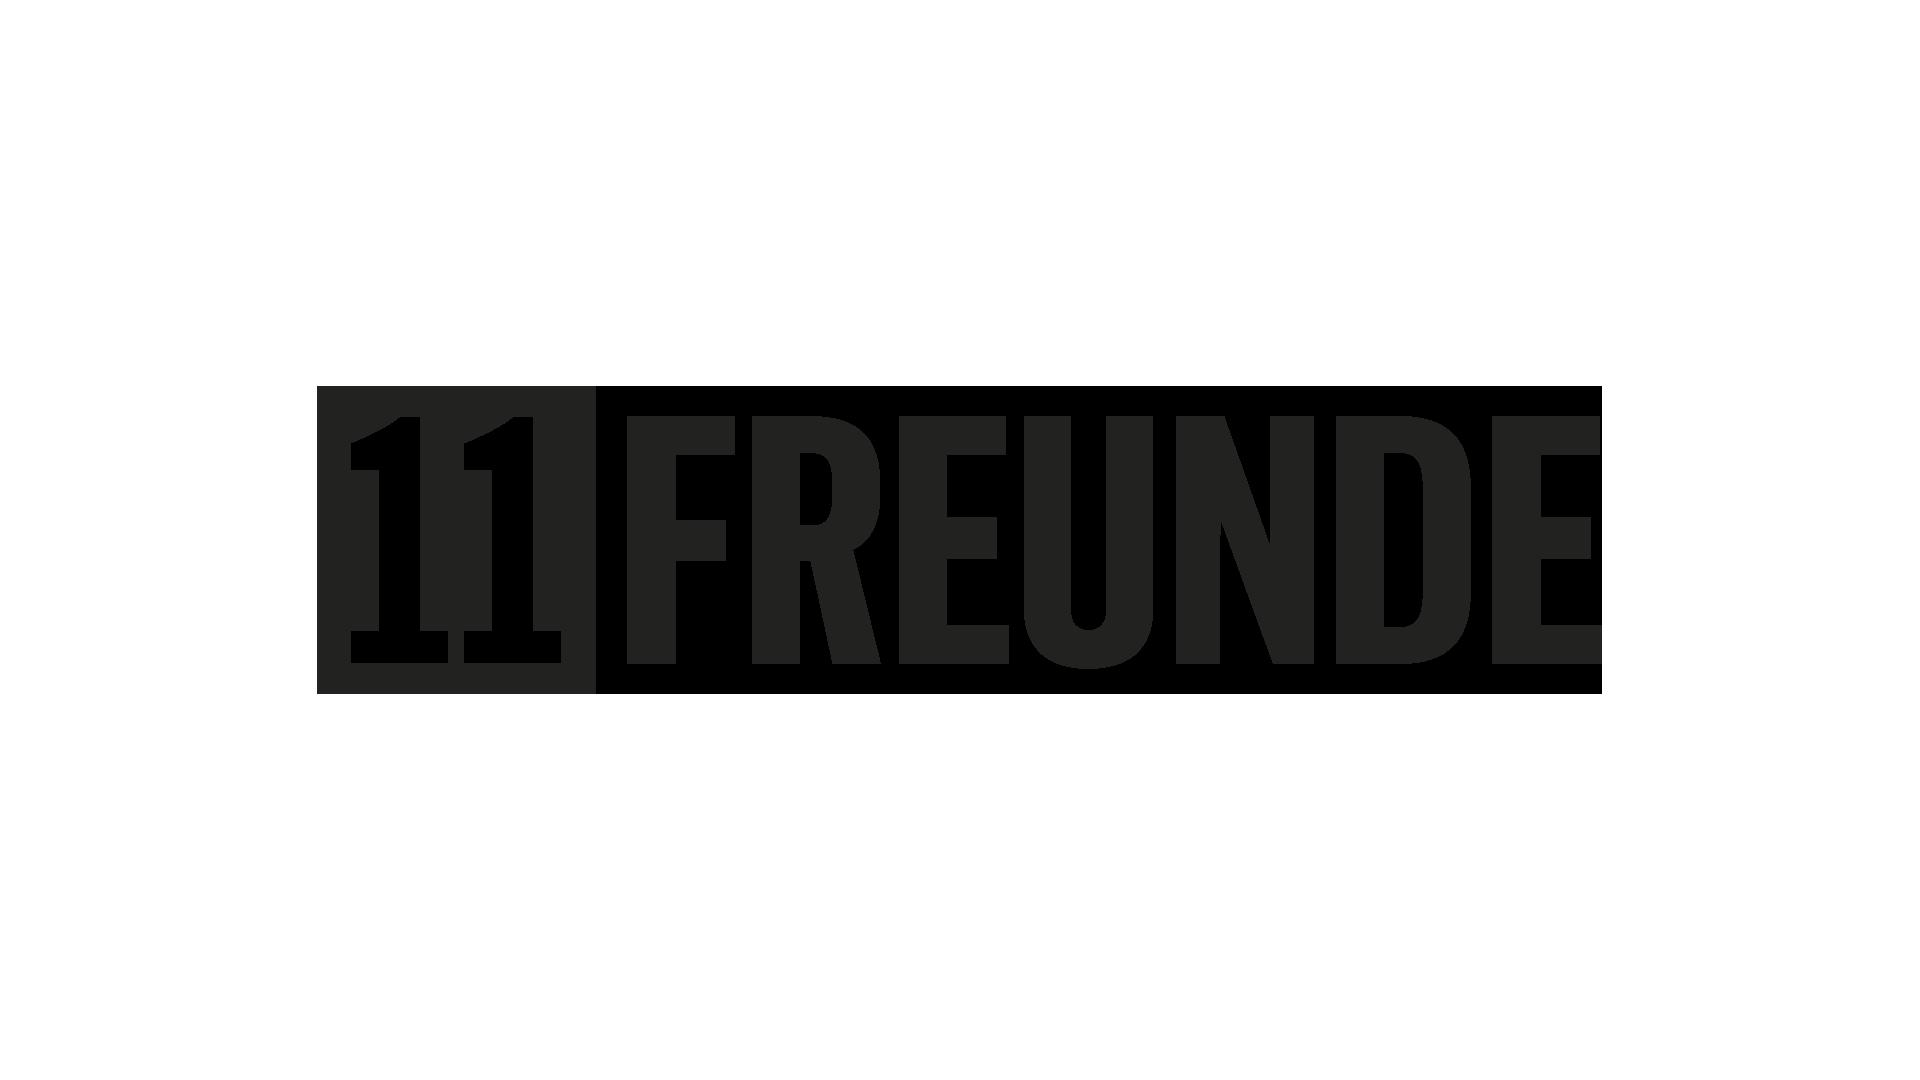 11-freunde